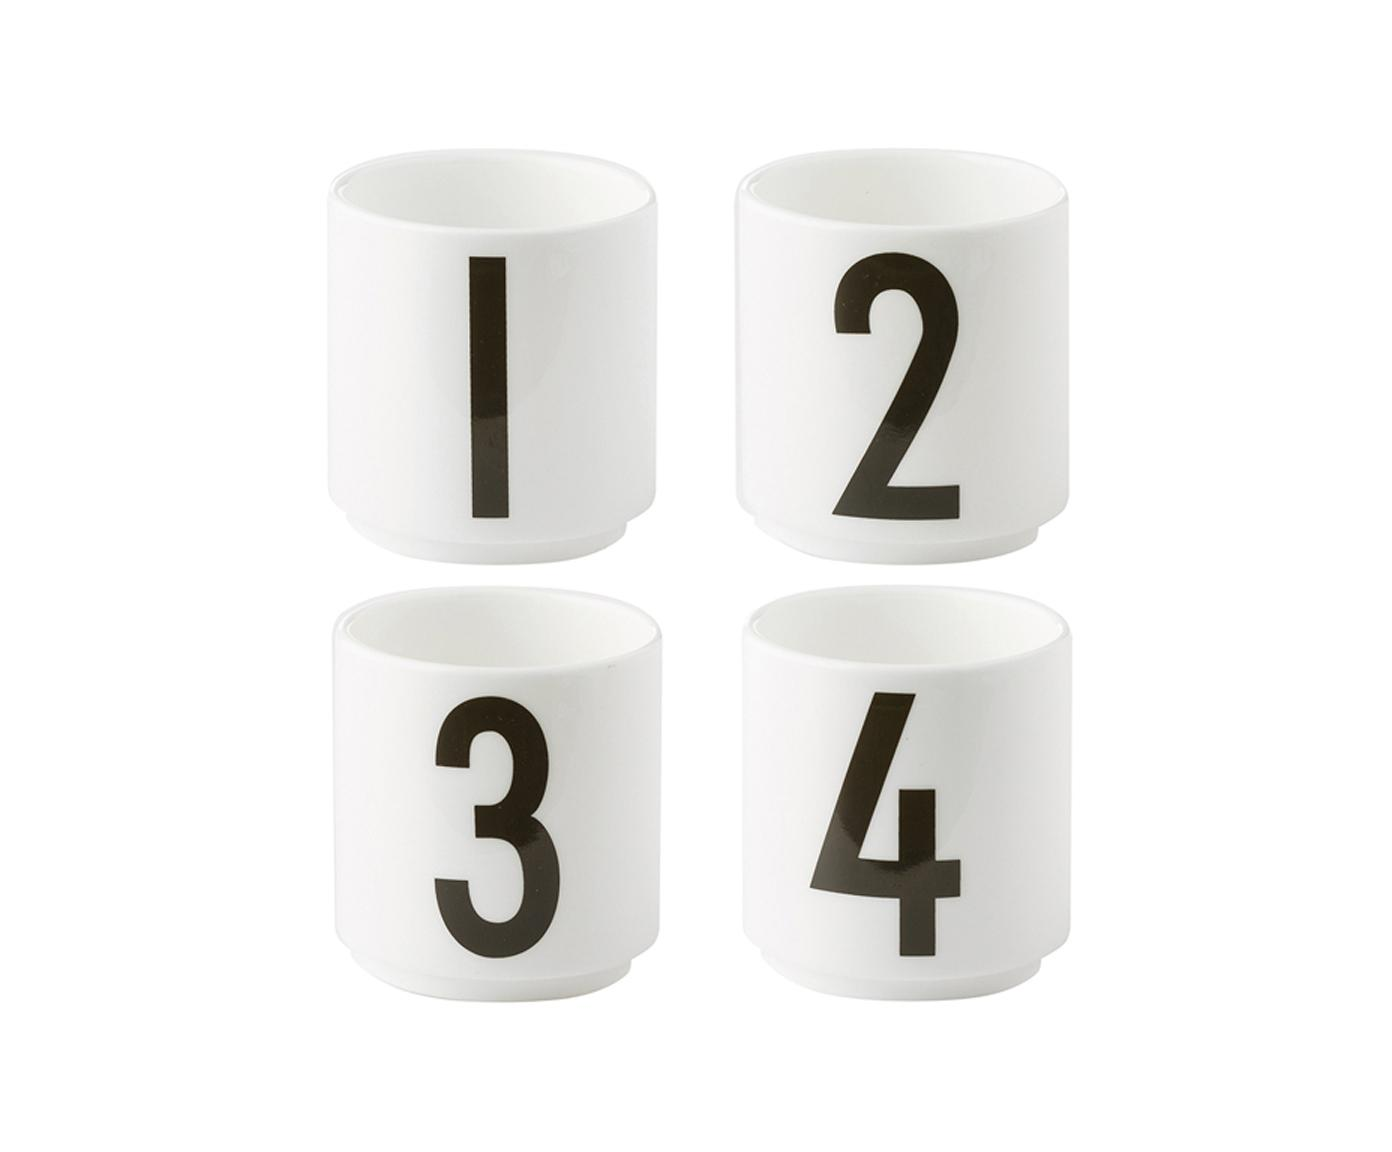 Set de tazas de café 1234, 4pzas., Porcelana fina, Blanco, negro, Ø 5 x Al 6 cm